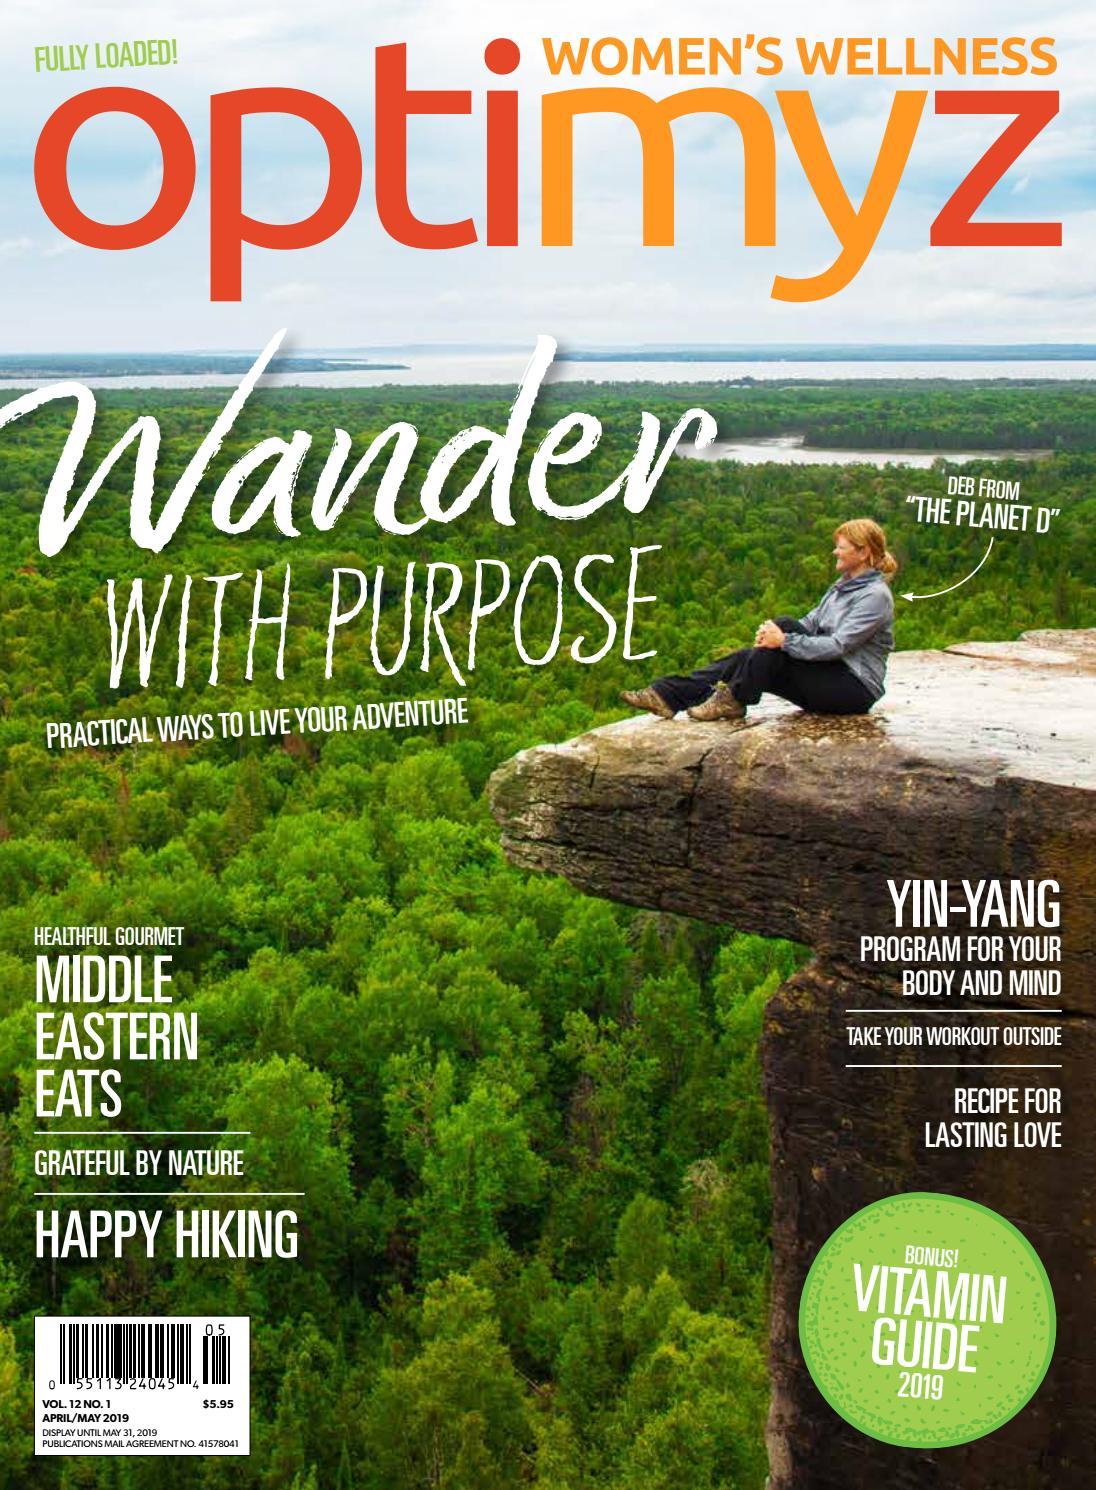 Wander with purpose by OptimyzMag - issuu